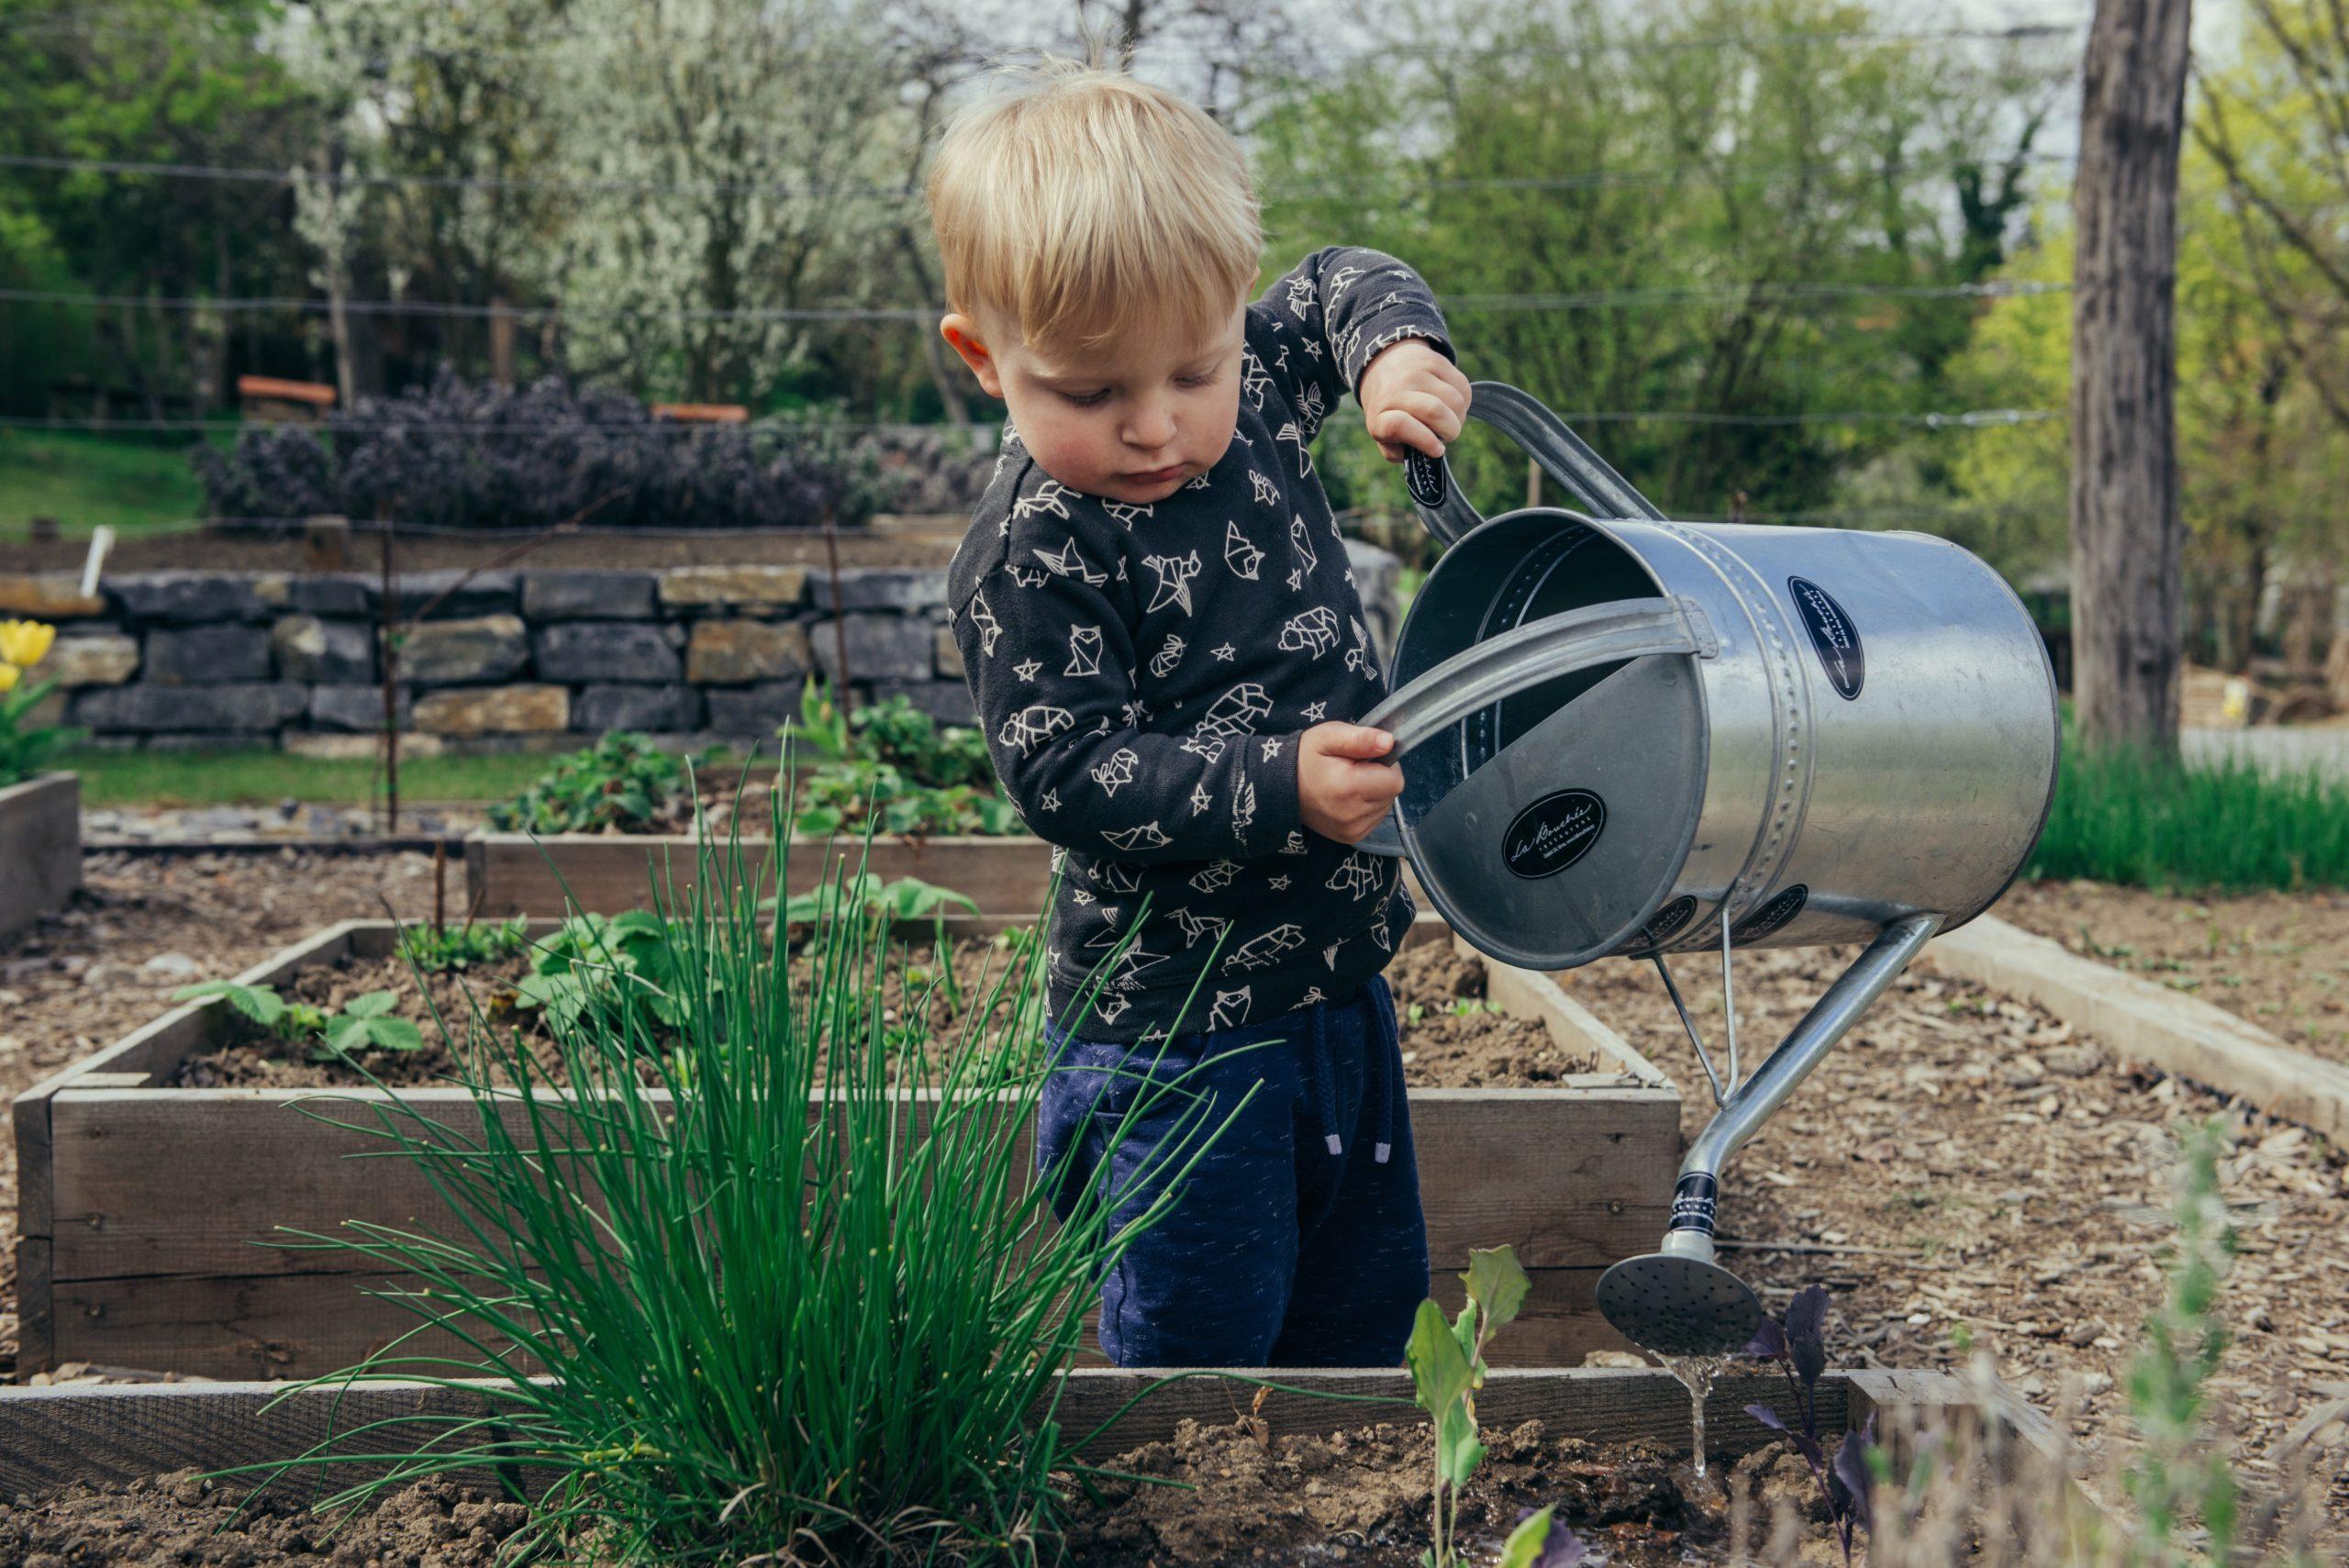 The Worldwide Growth of School Gardens: Insights into Switzerland, Ethiopia, Peru, and Myanmar